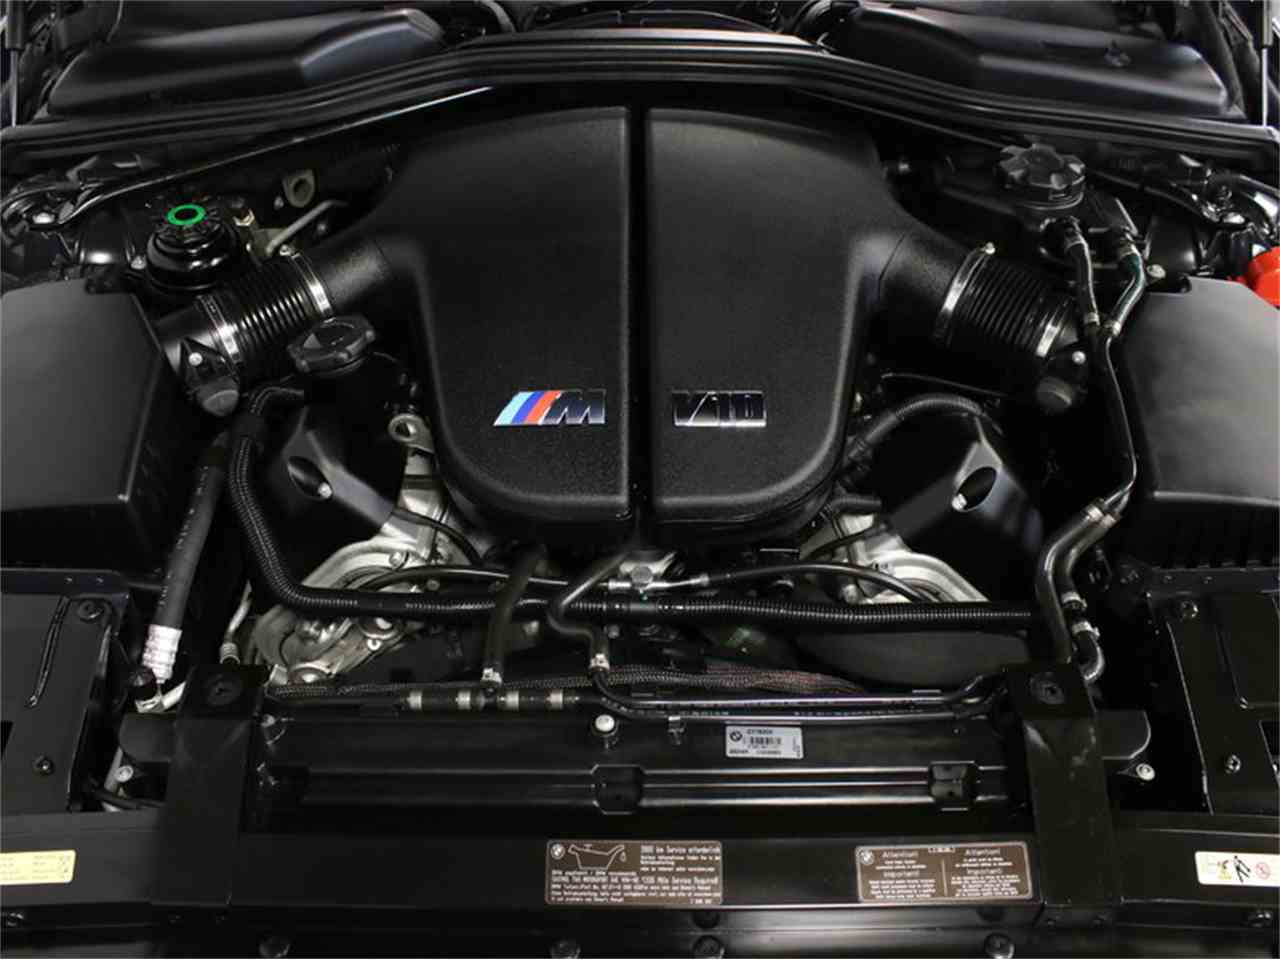 2007 BMW M6 Neiman Marcus Edition for Sale | ClassicCars.com | CC-923922